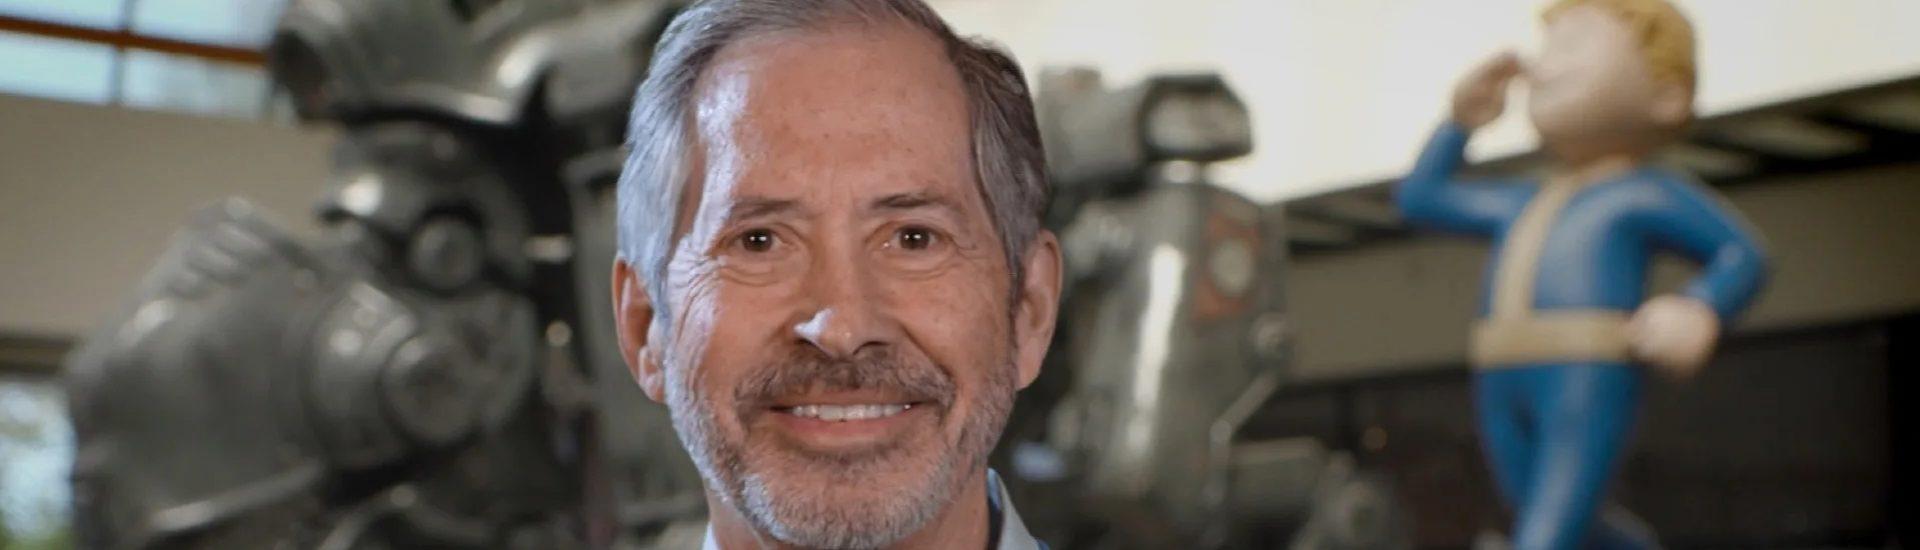 Bethesda-Chef Robert A. Altman ist verstorben